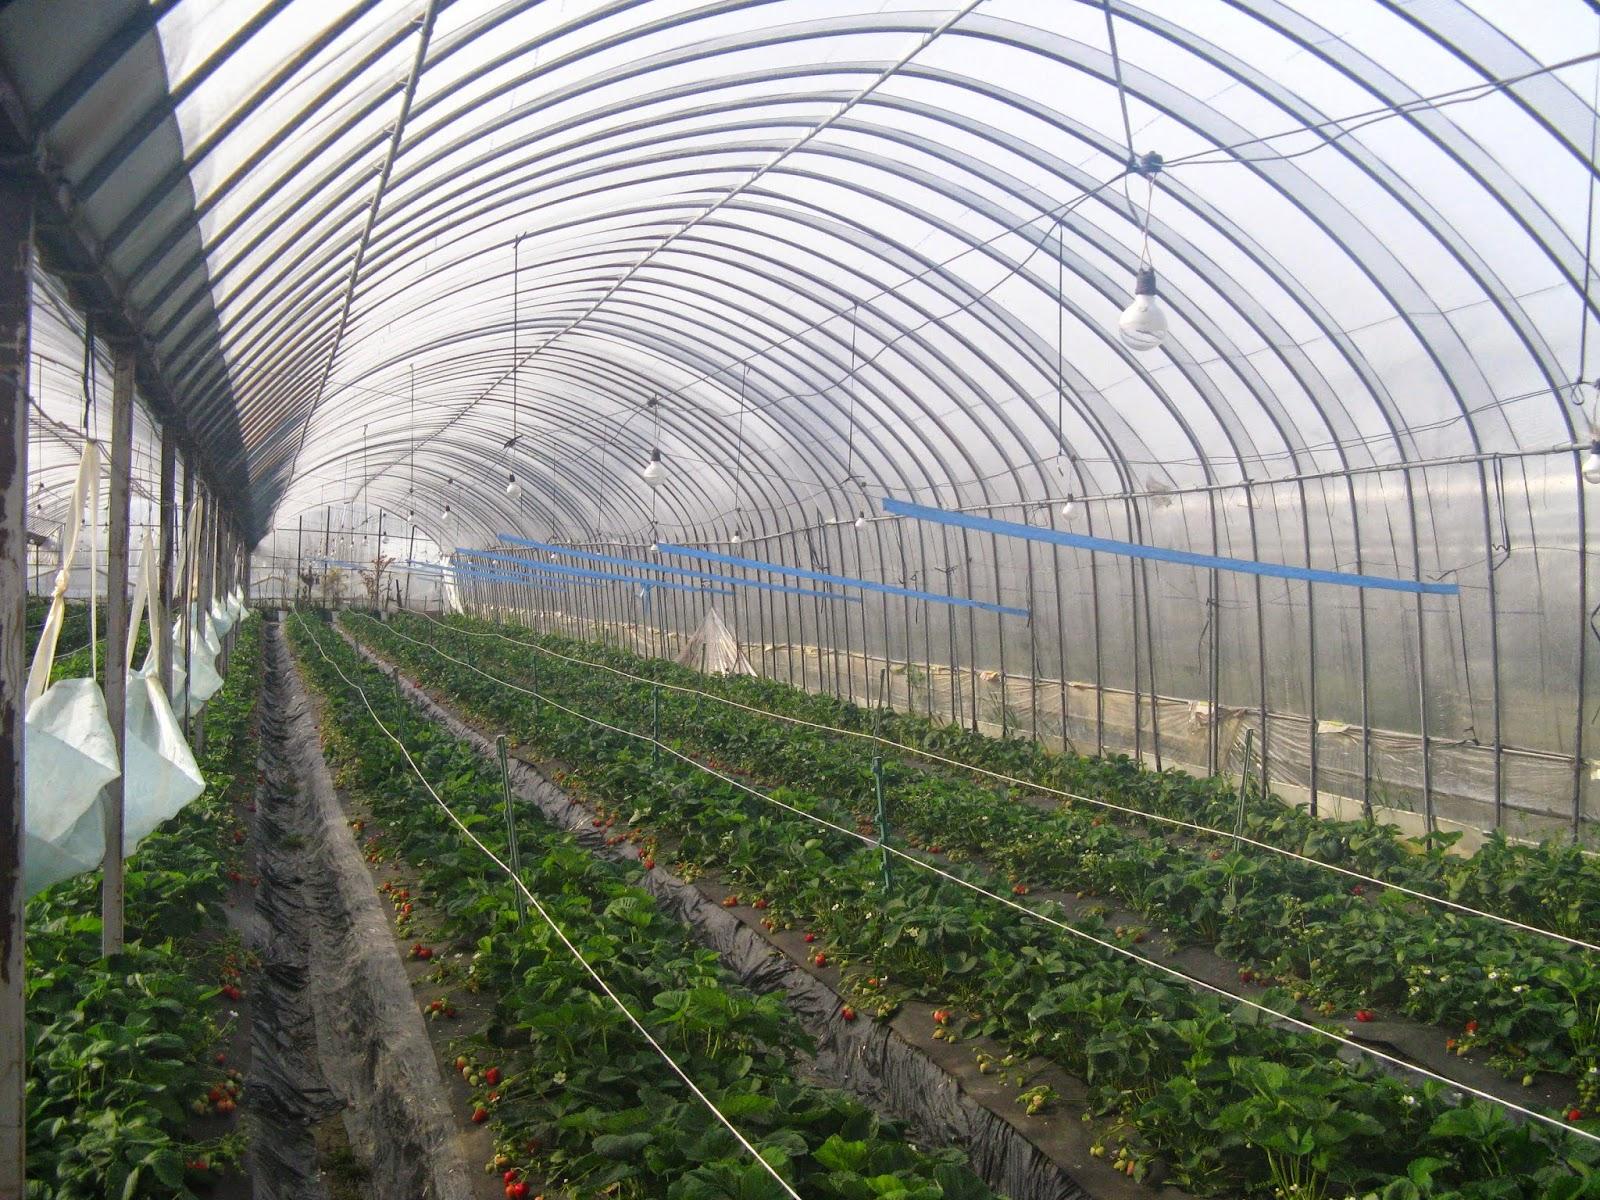 Japanese Strawberry Farm